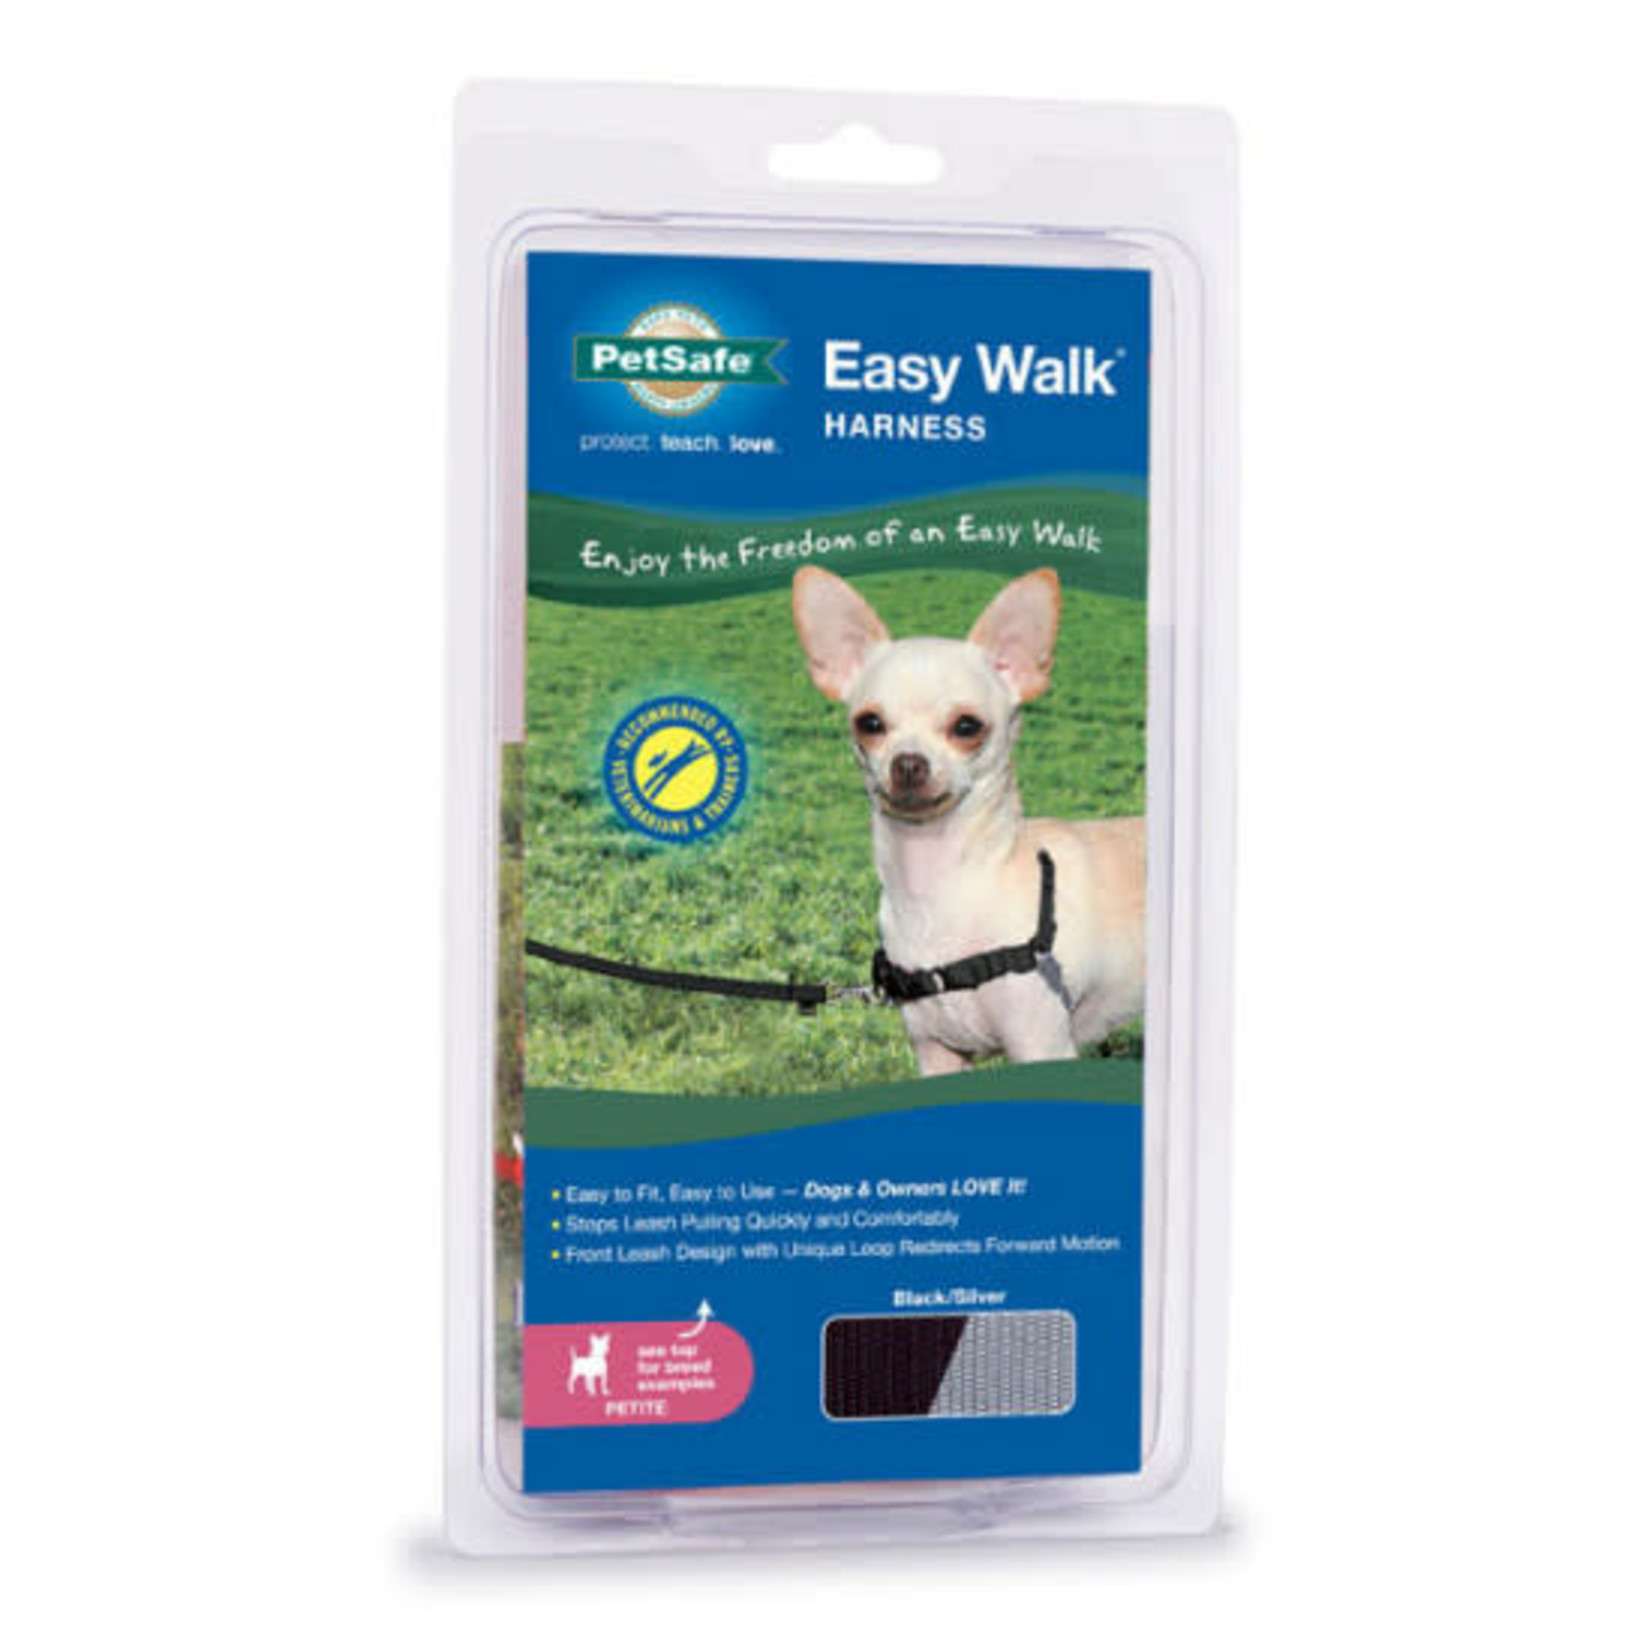 Petsafe PETSAFE Harness Easy Walk Petite Black & Silver